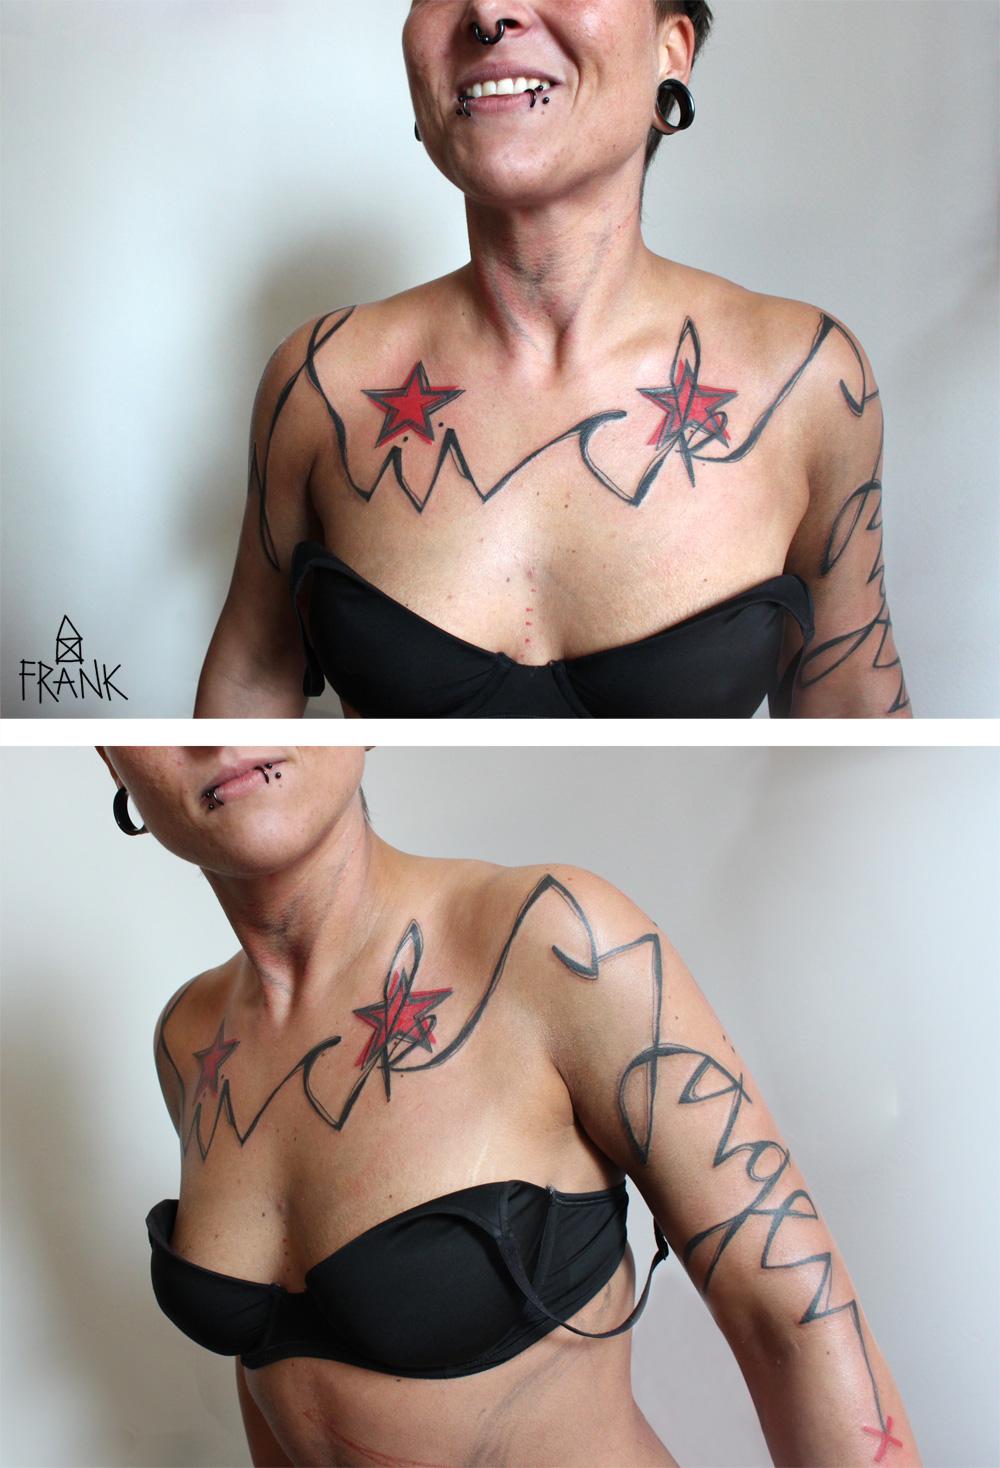 Miriam_frank_tattoo_type